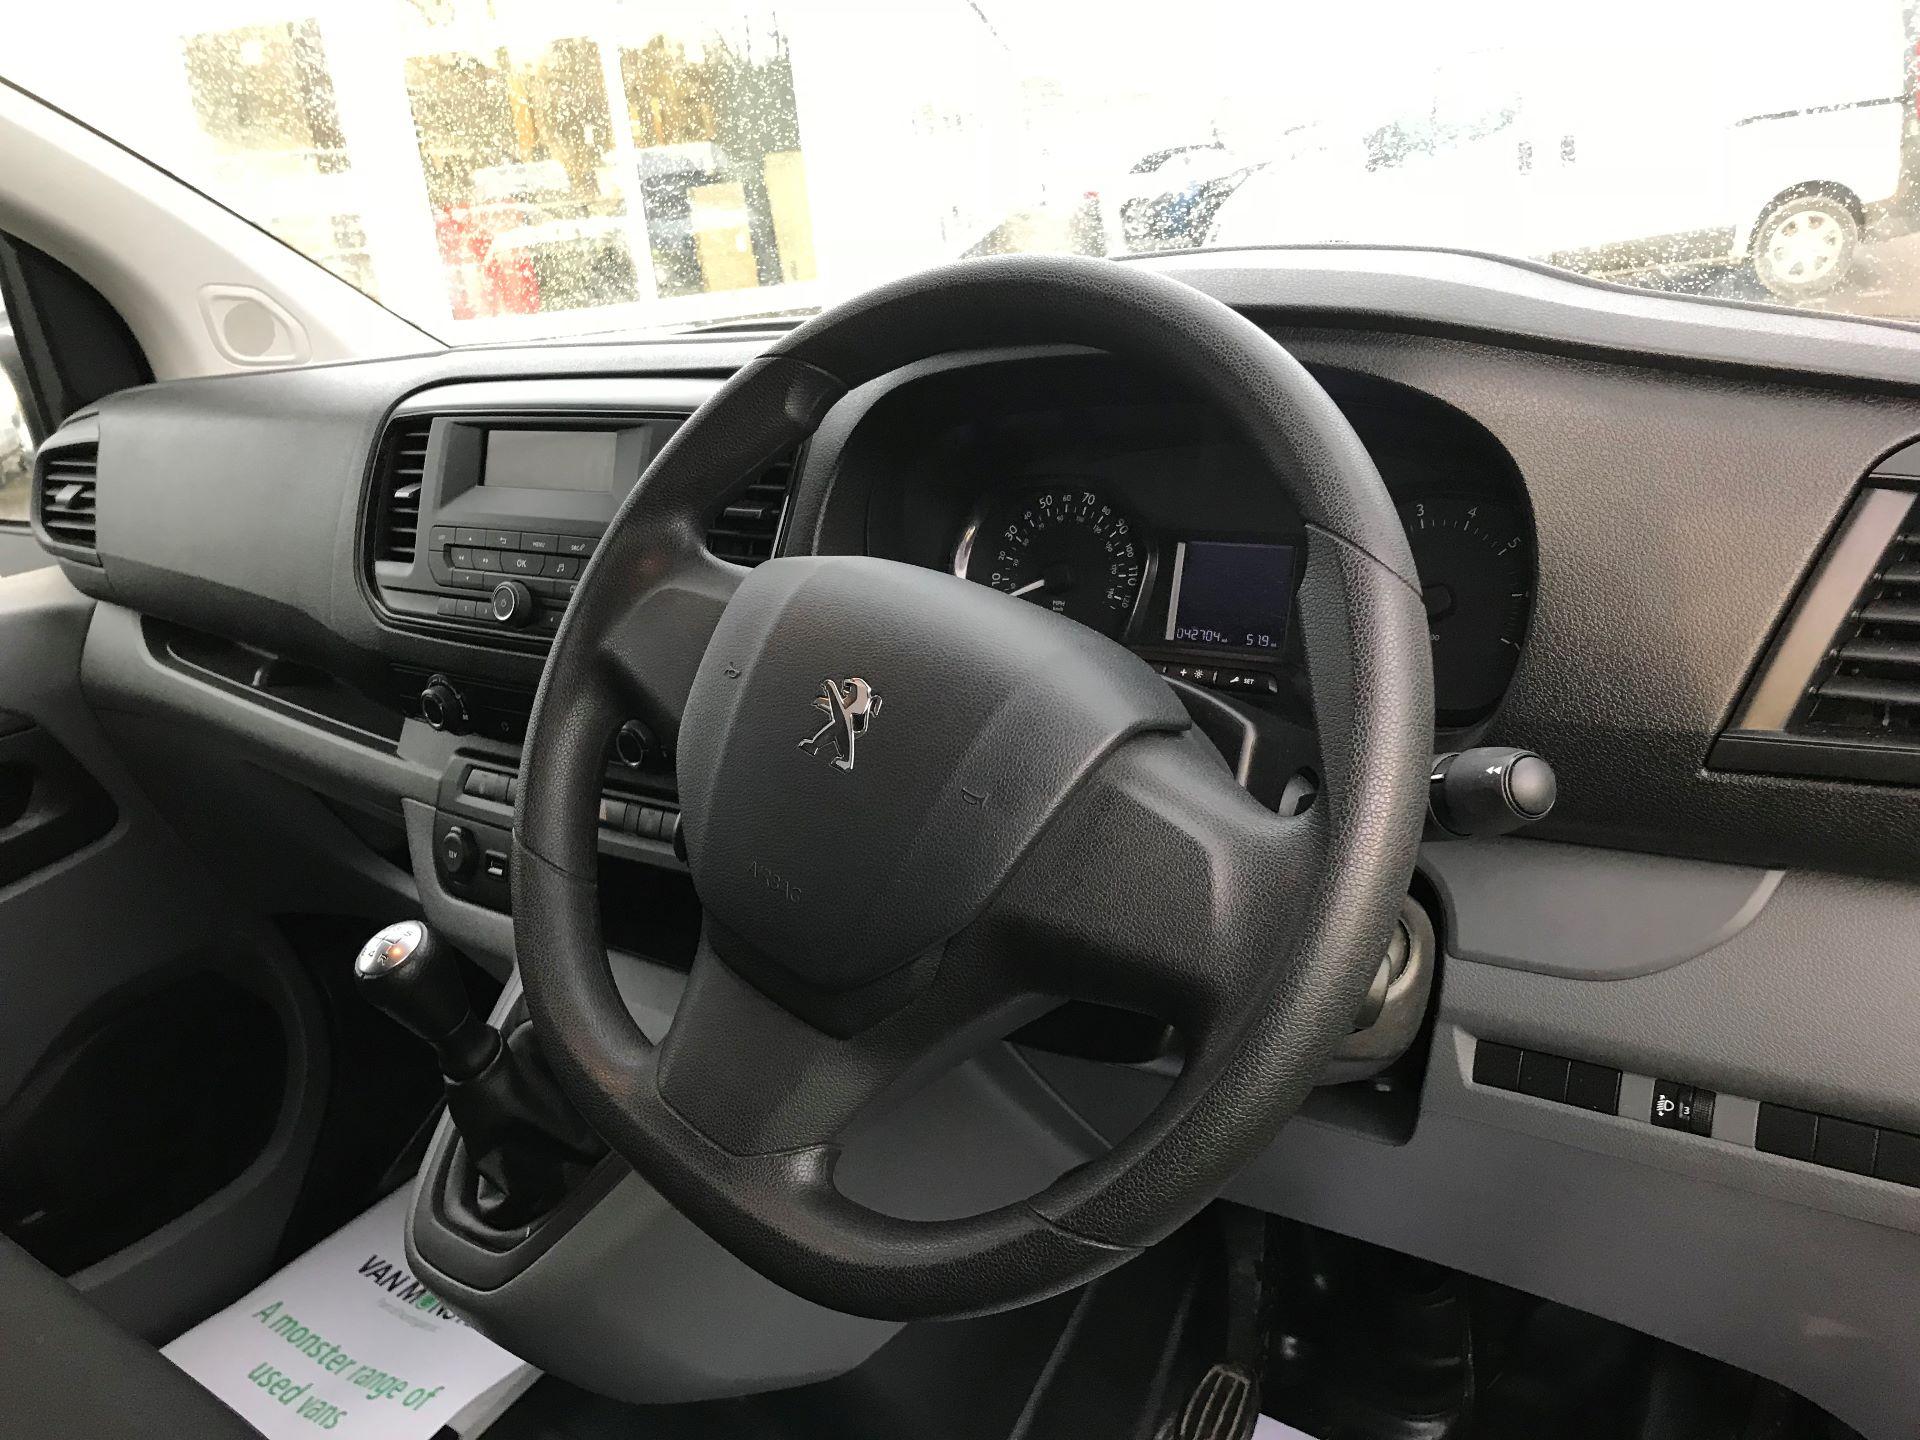 2018 Peugeot Expert  STANDARD 1000 1.6 BLUEHDI 95 S EURO 6 (NU18VTP) Image 17